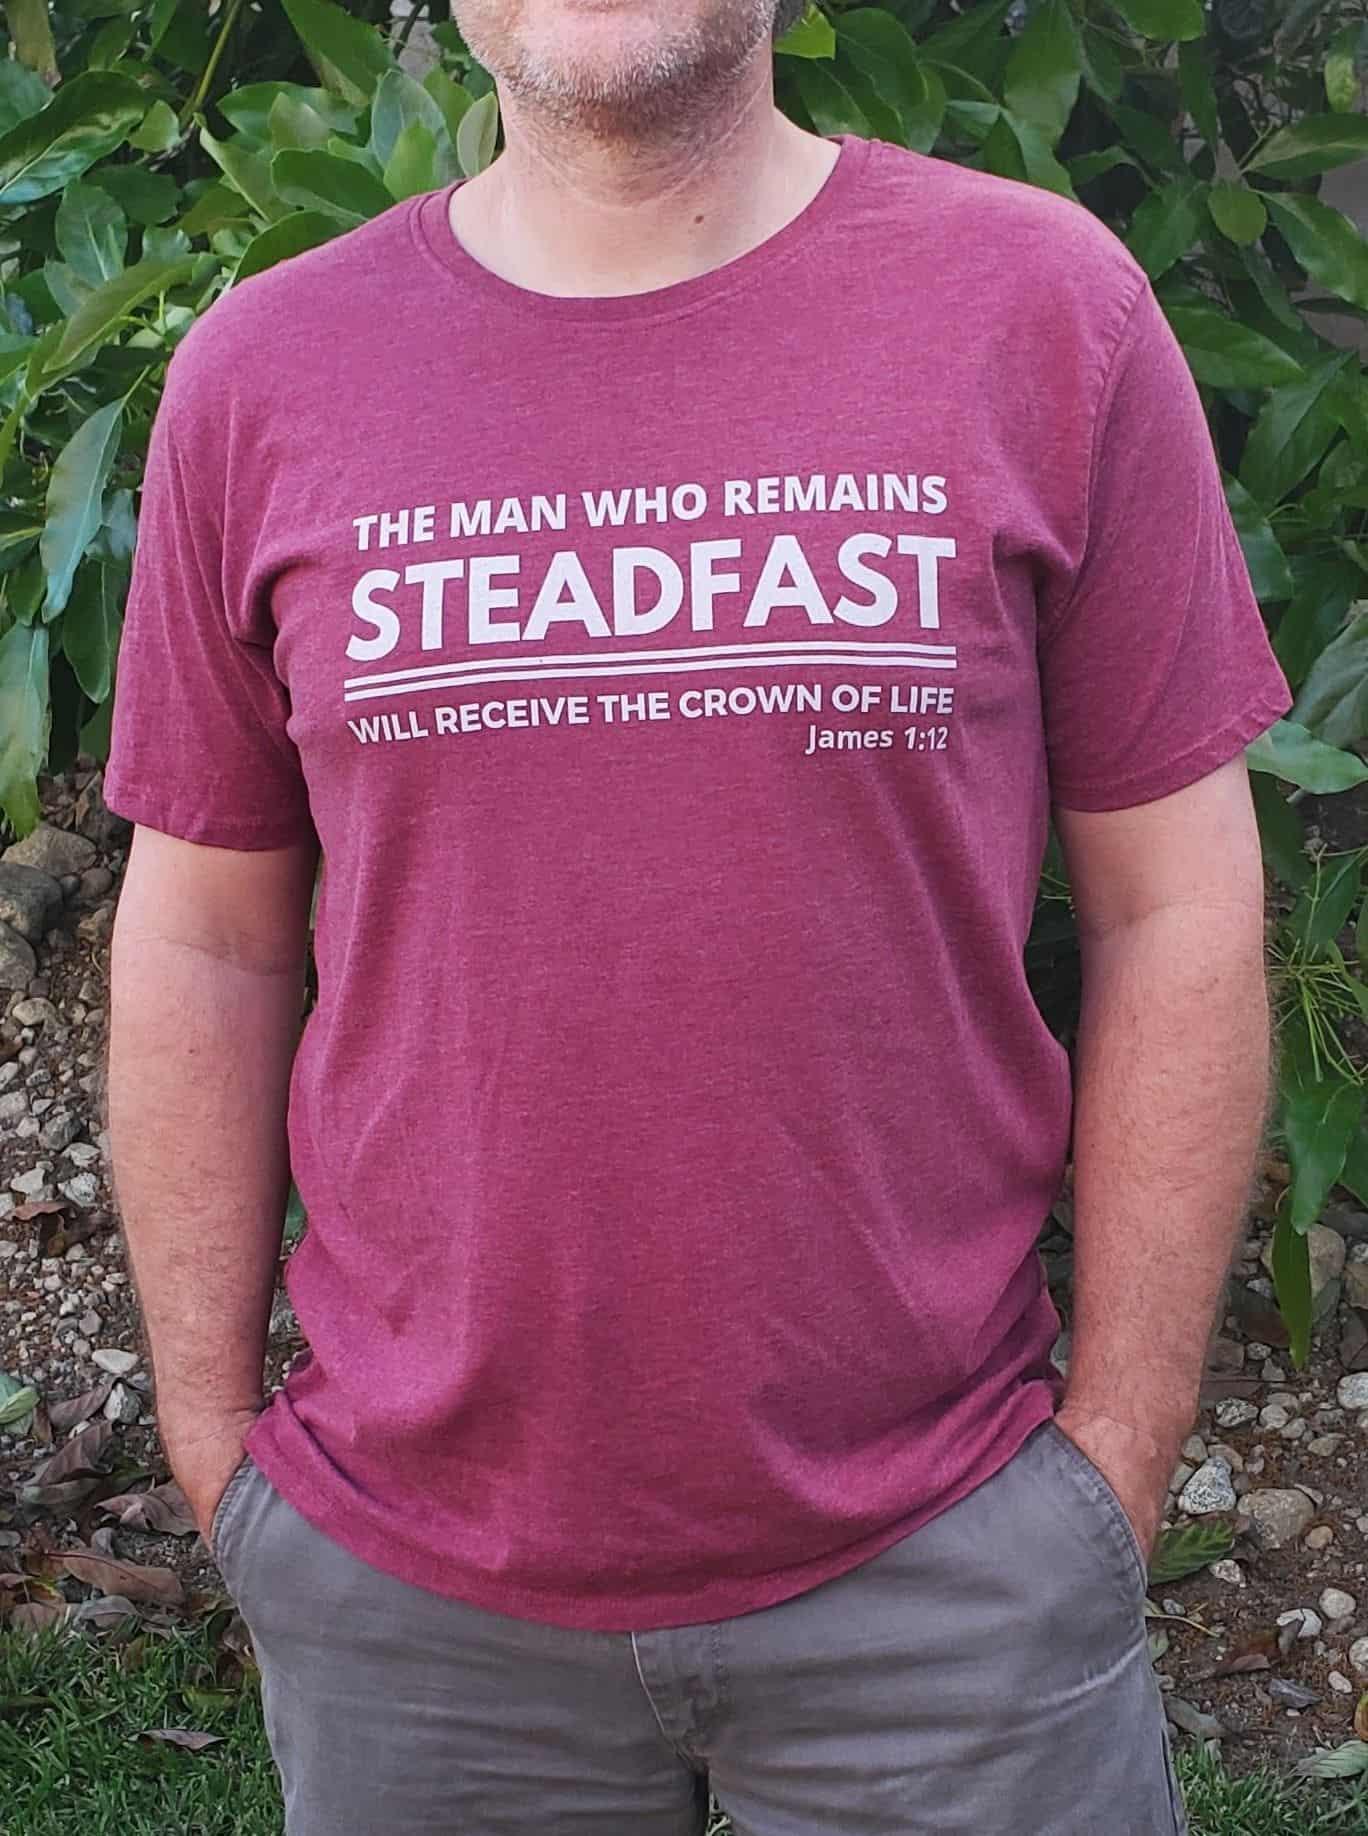 Steadfast Christian Shirt for Men